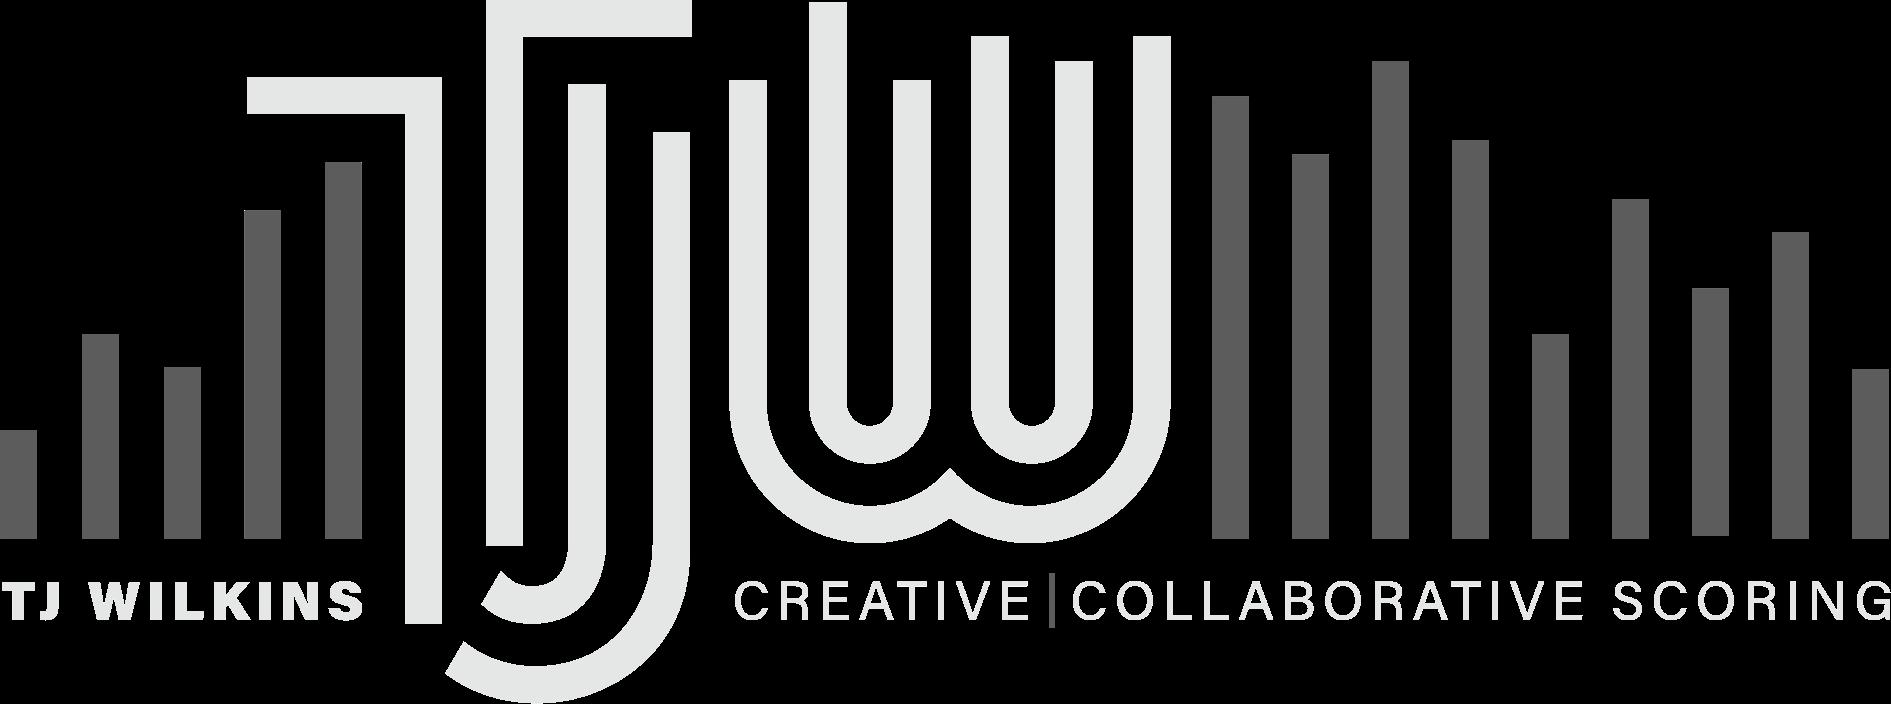 TJ WILKINS Logo Secondary (full.white).png